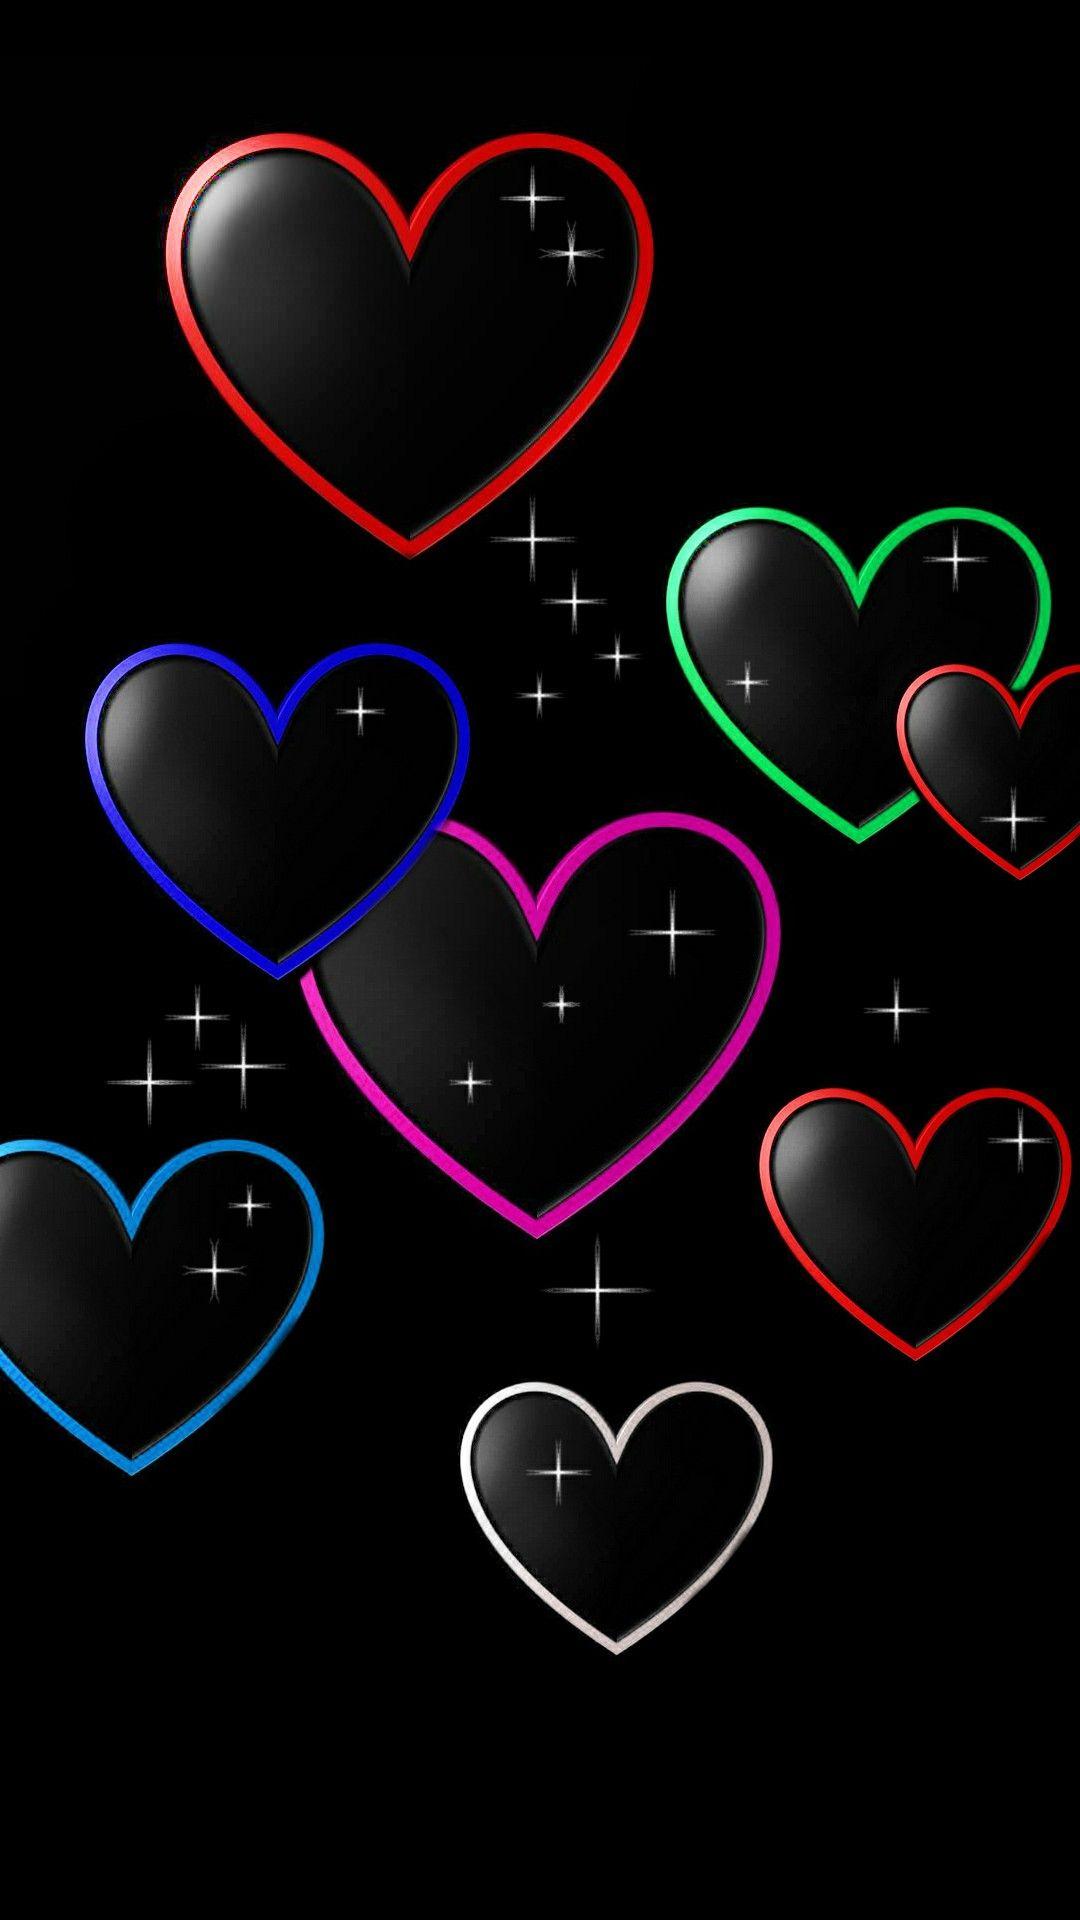 Multi Color Hearts Heart Wallpaper Love Wallpaper Valentines Wallpaper